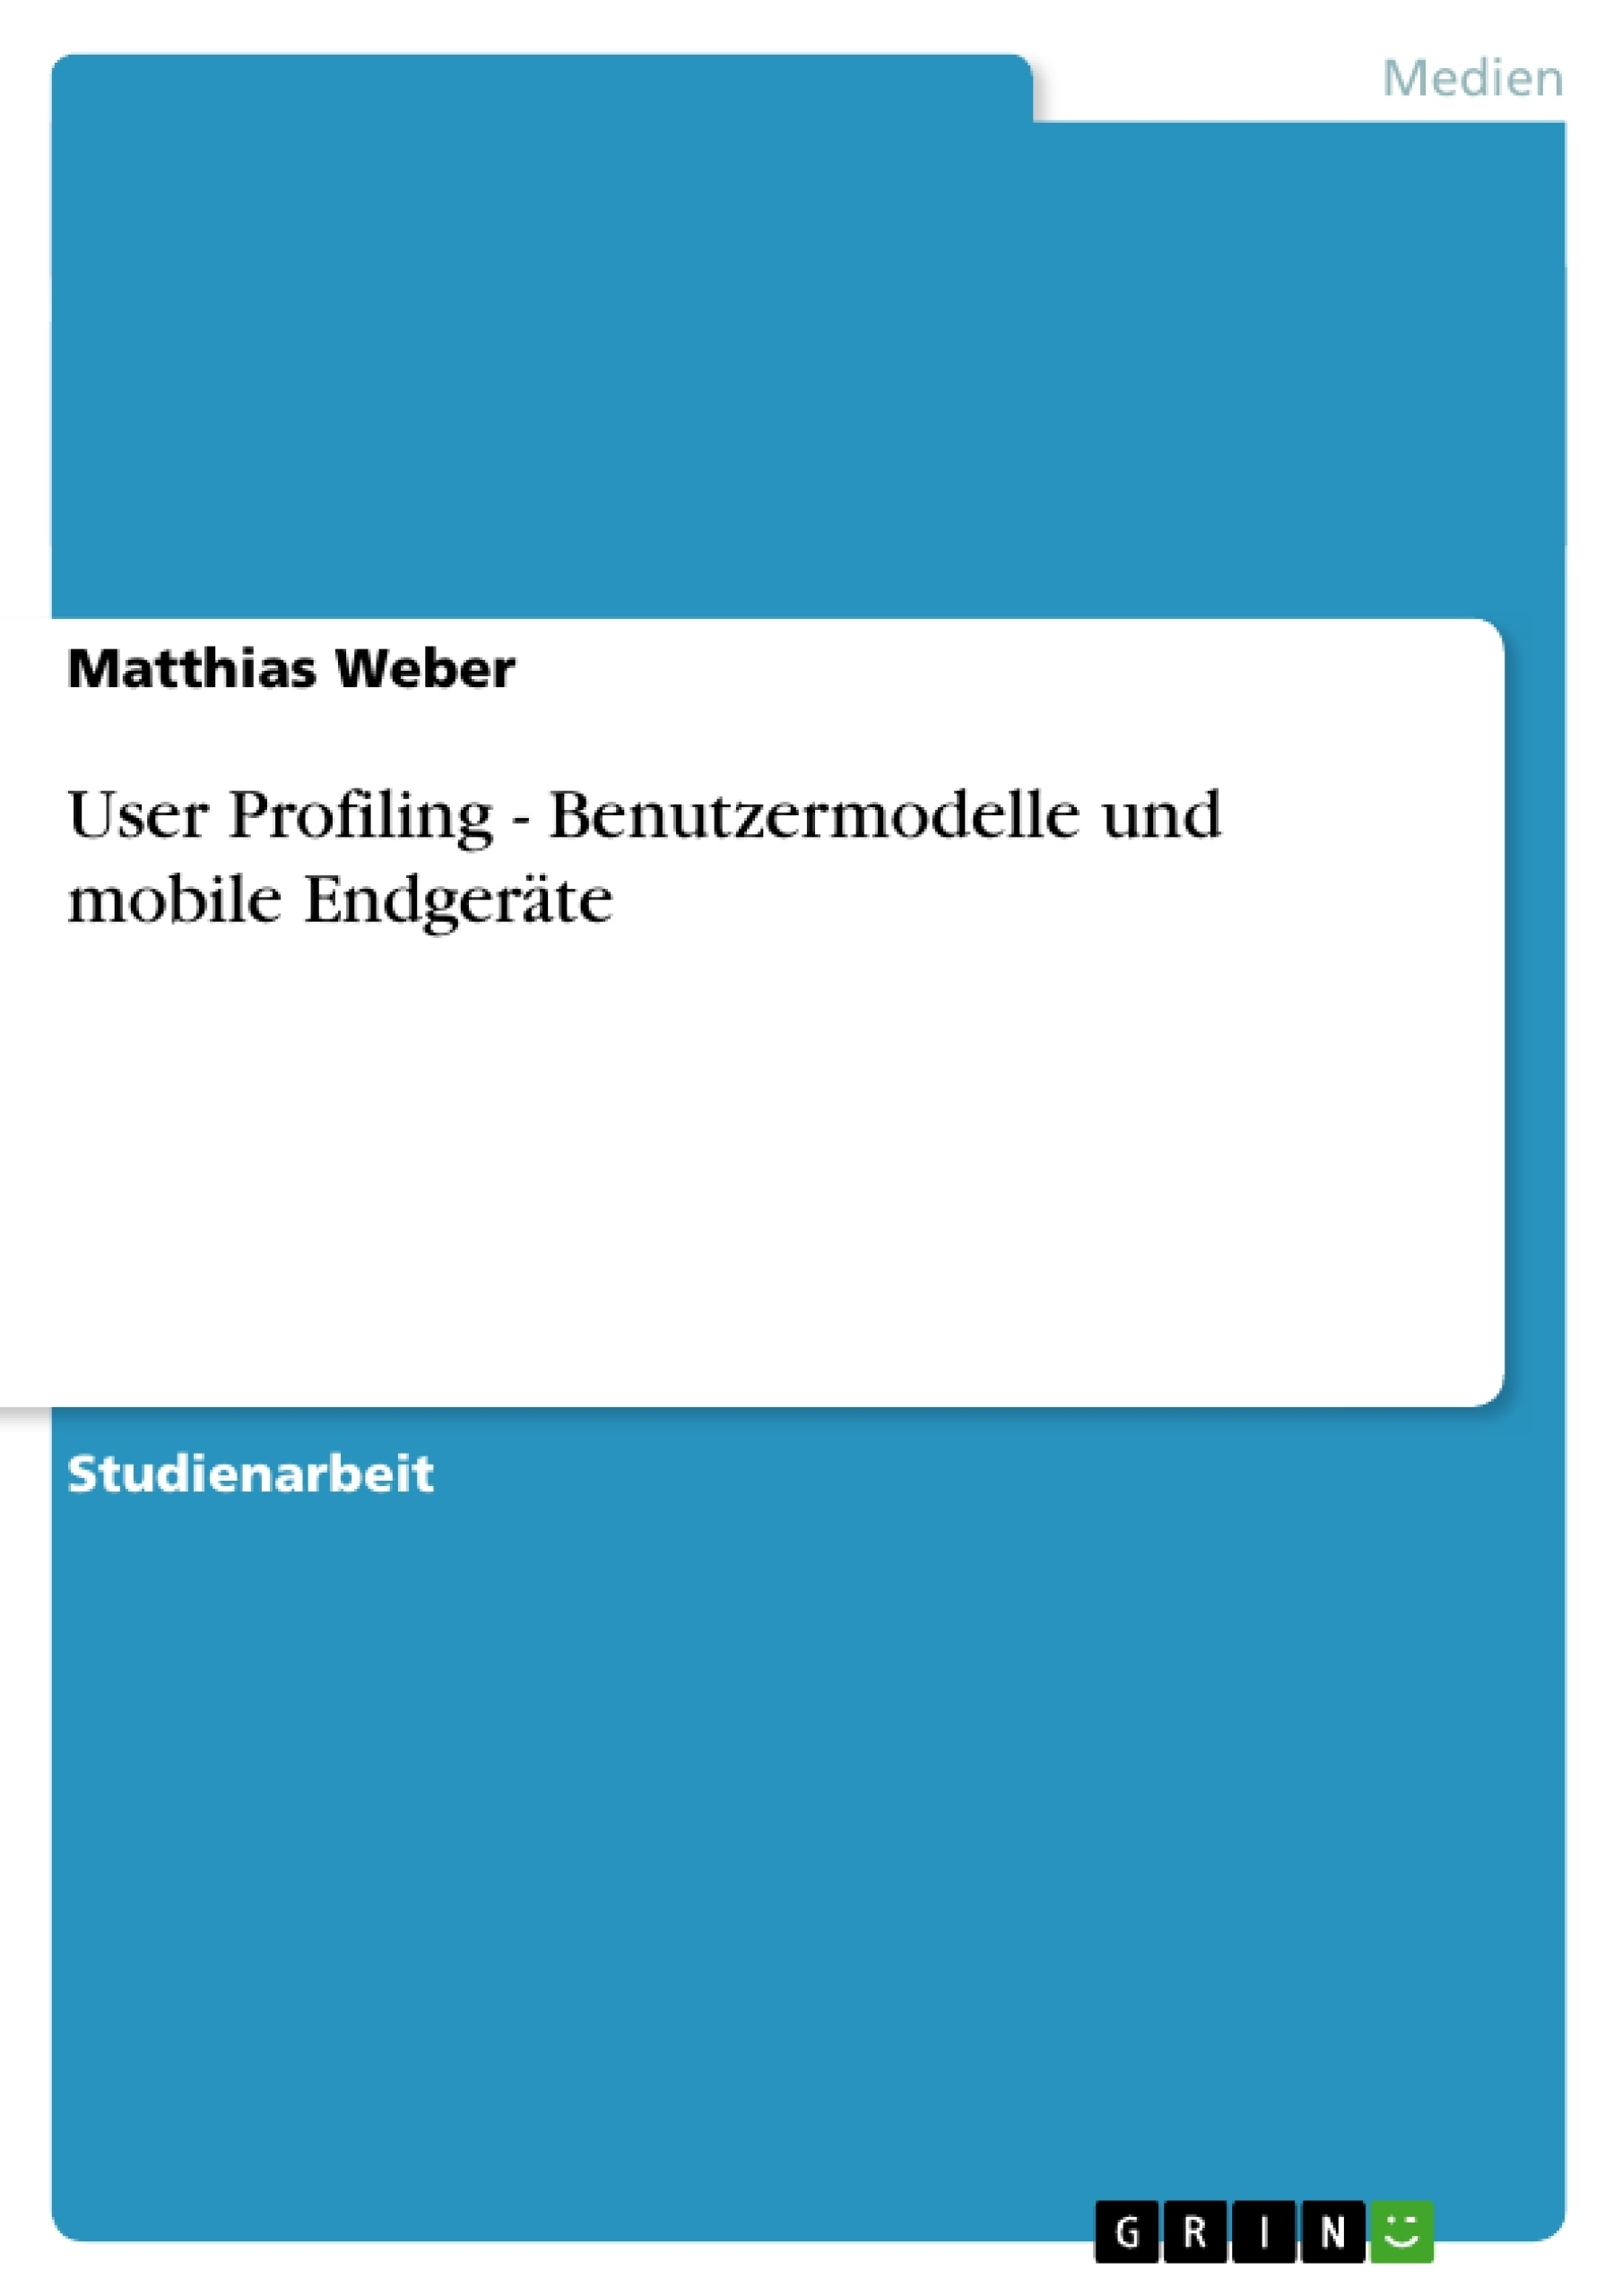 Titel: User Profiling - Benutzermodelle und mobile Endgeräte